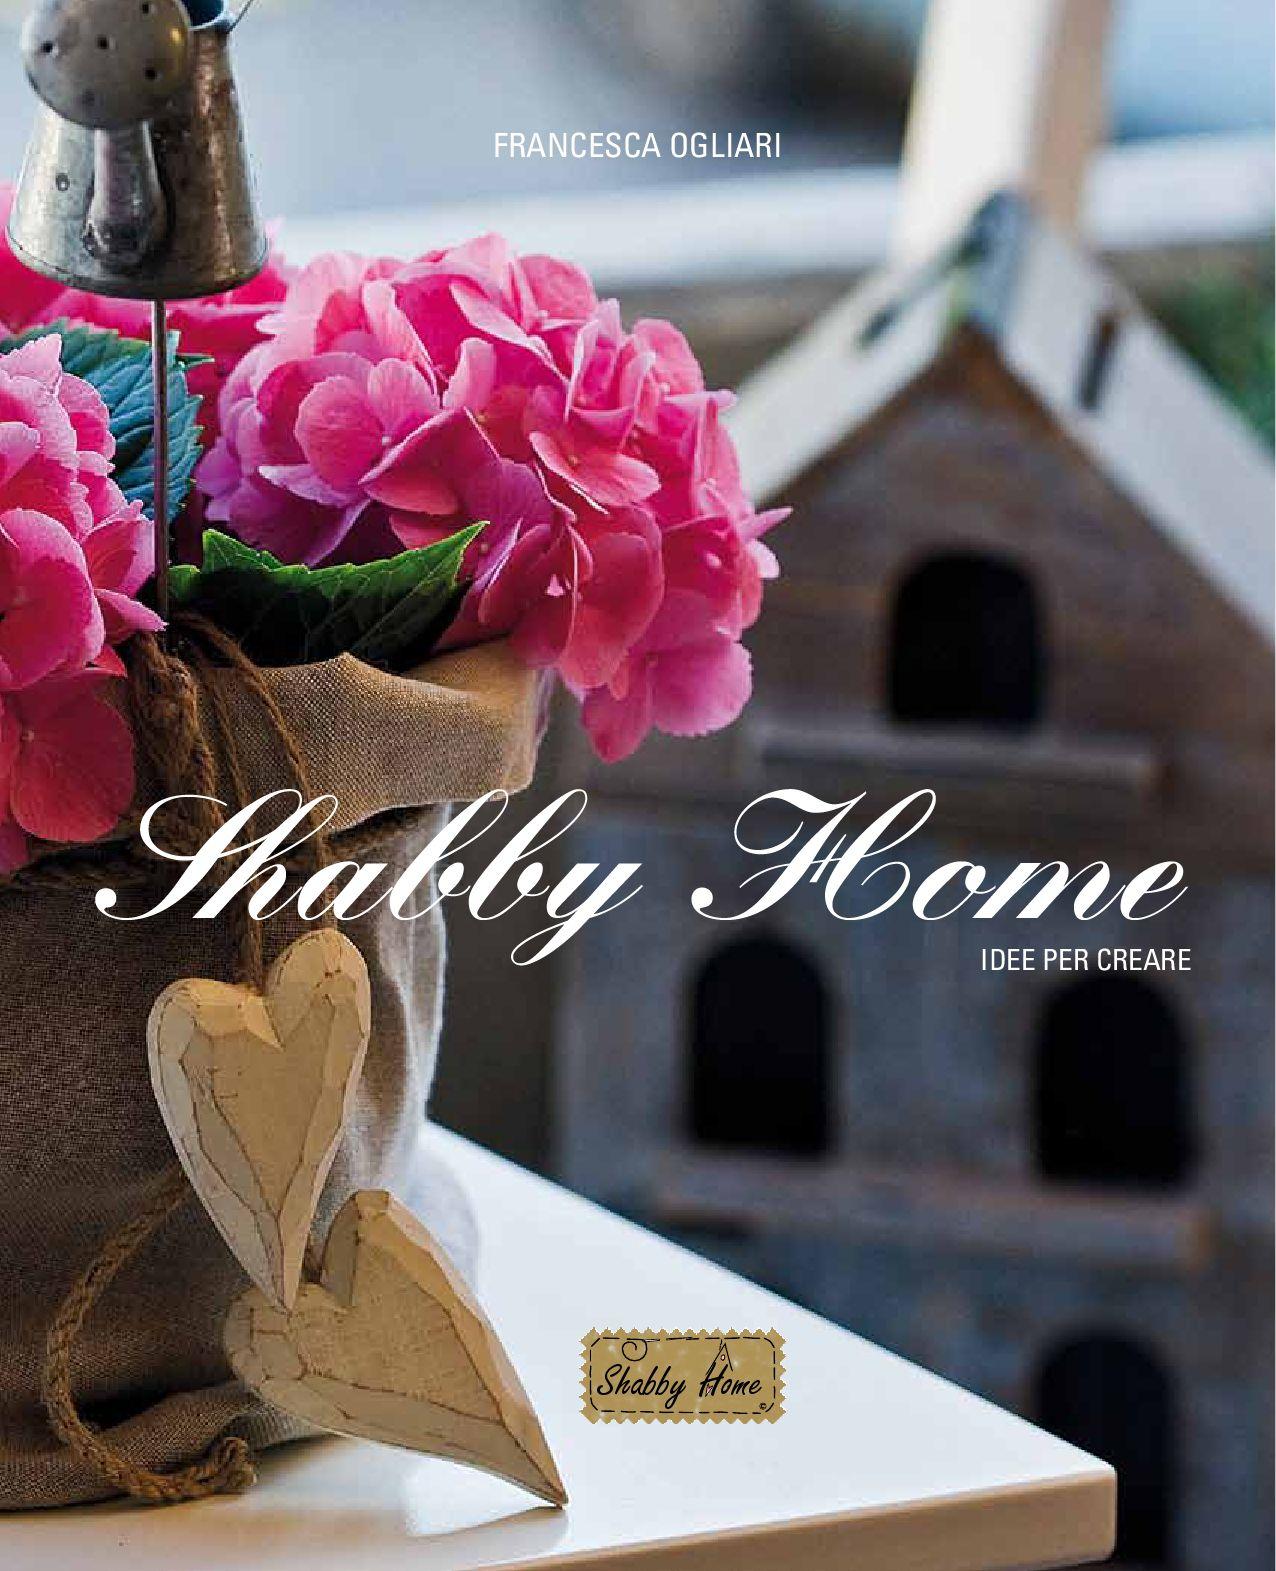 Shabby home idee per creare by francesca ogliari issuu - Idee shabby da creare ...